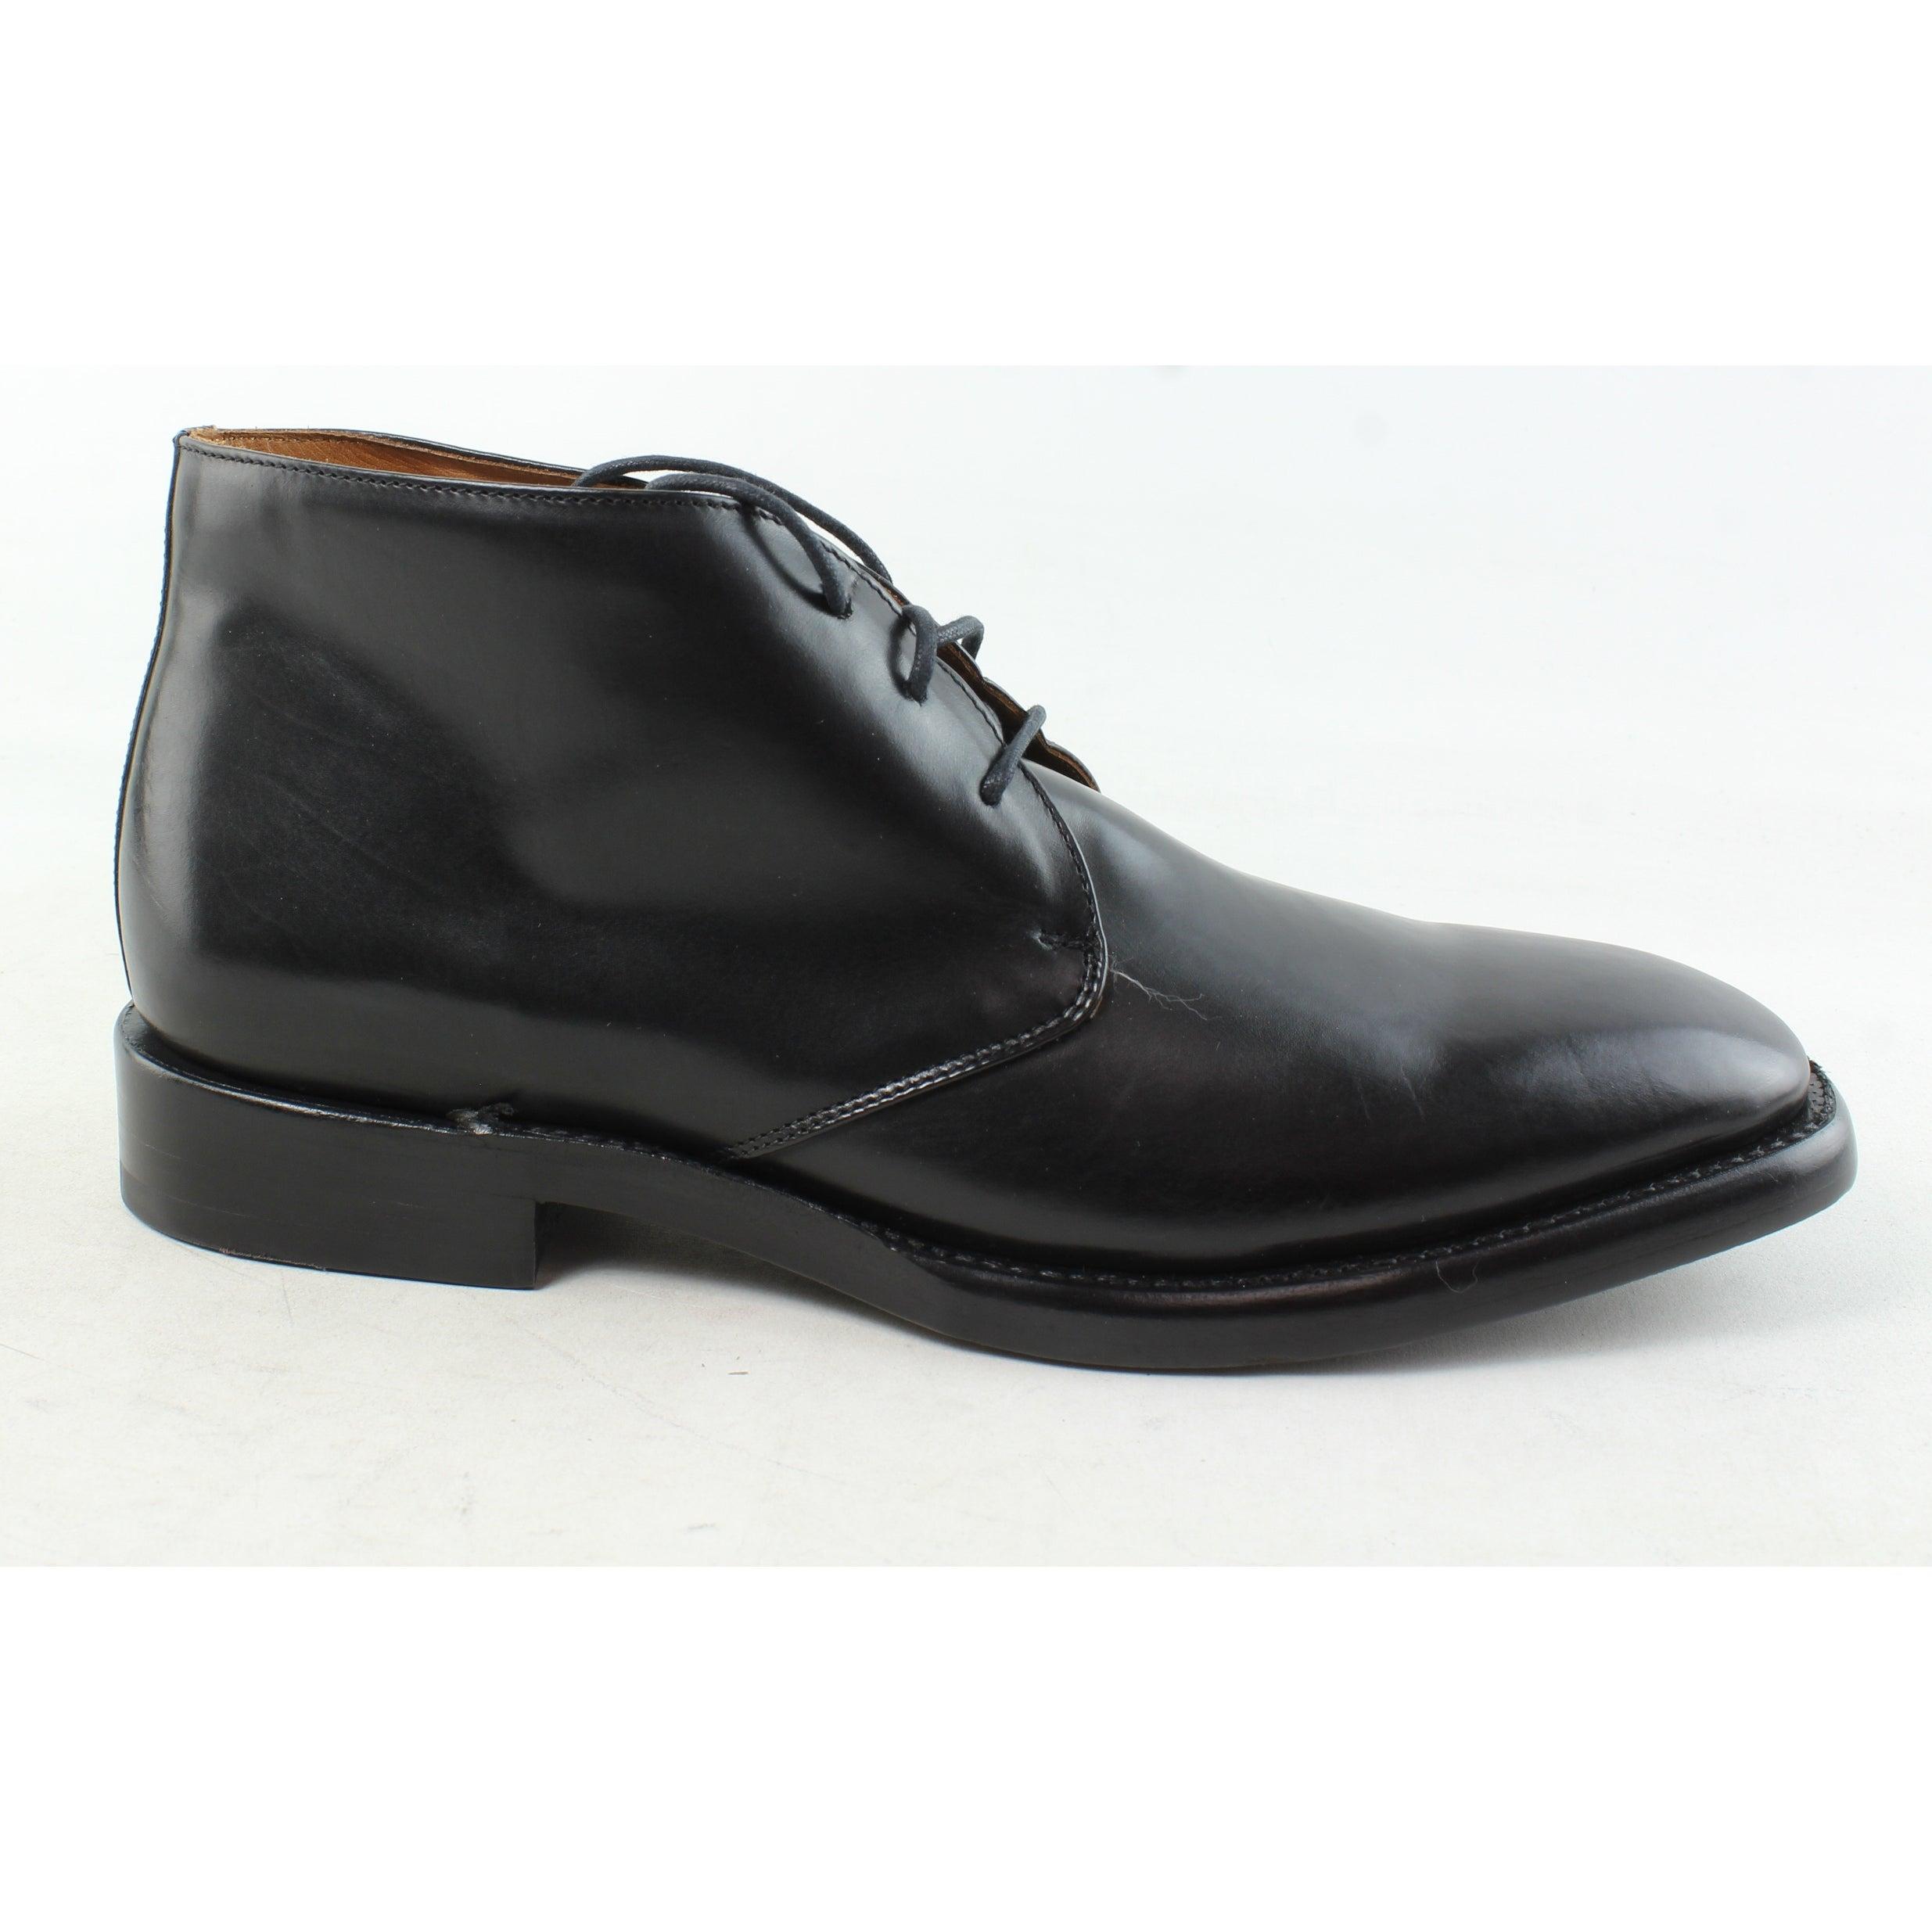 Frye Mens Weston Black Ankle Boots Size